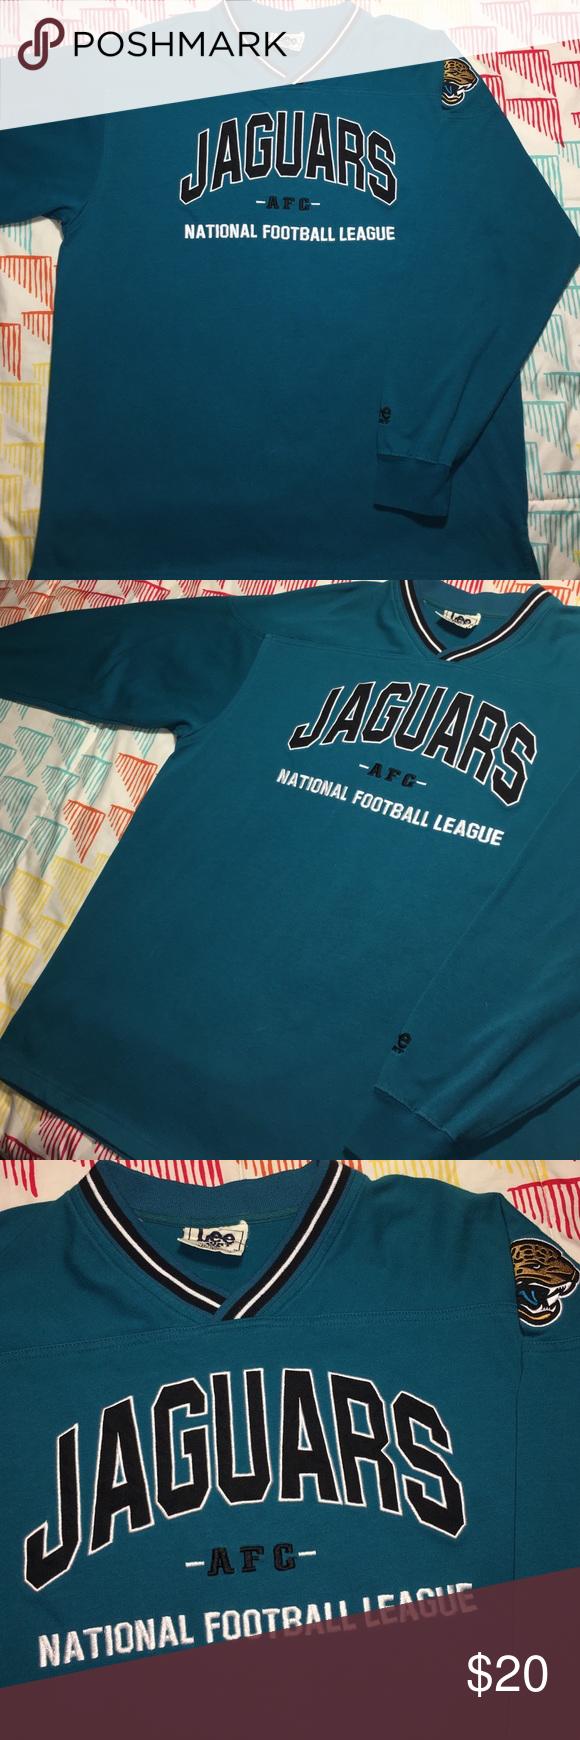 t size eu jaguars shirt vintage us logo jacksonville sleeve short listings xxl jaguar shirts